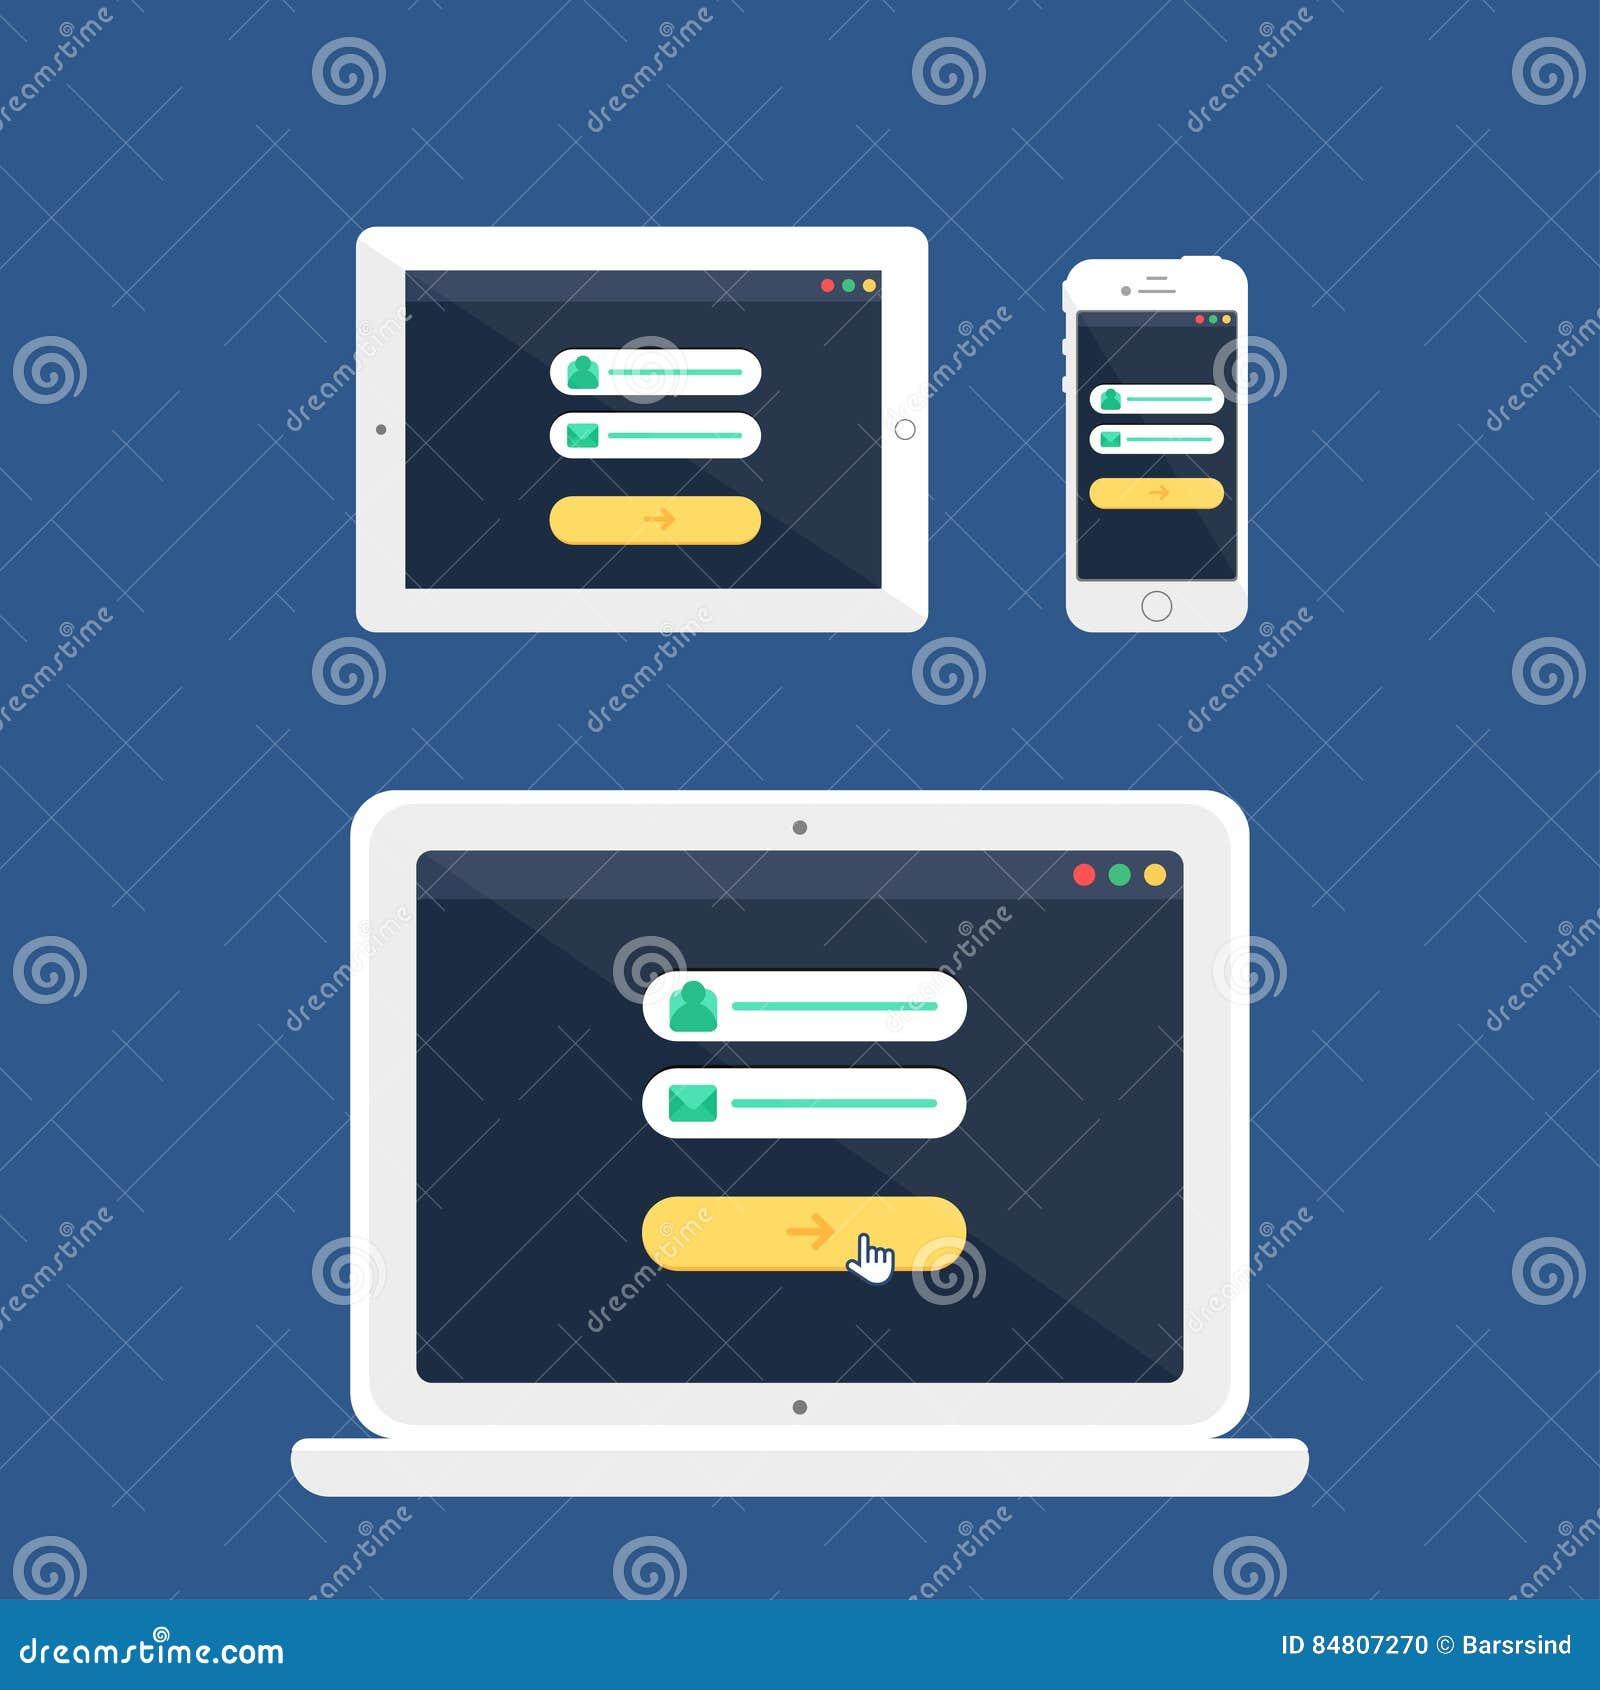 Web Template Of Adaptive Online Login Form Stock Illustration